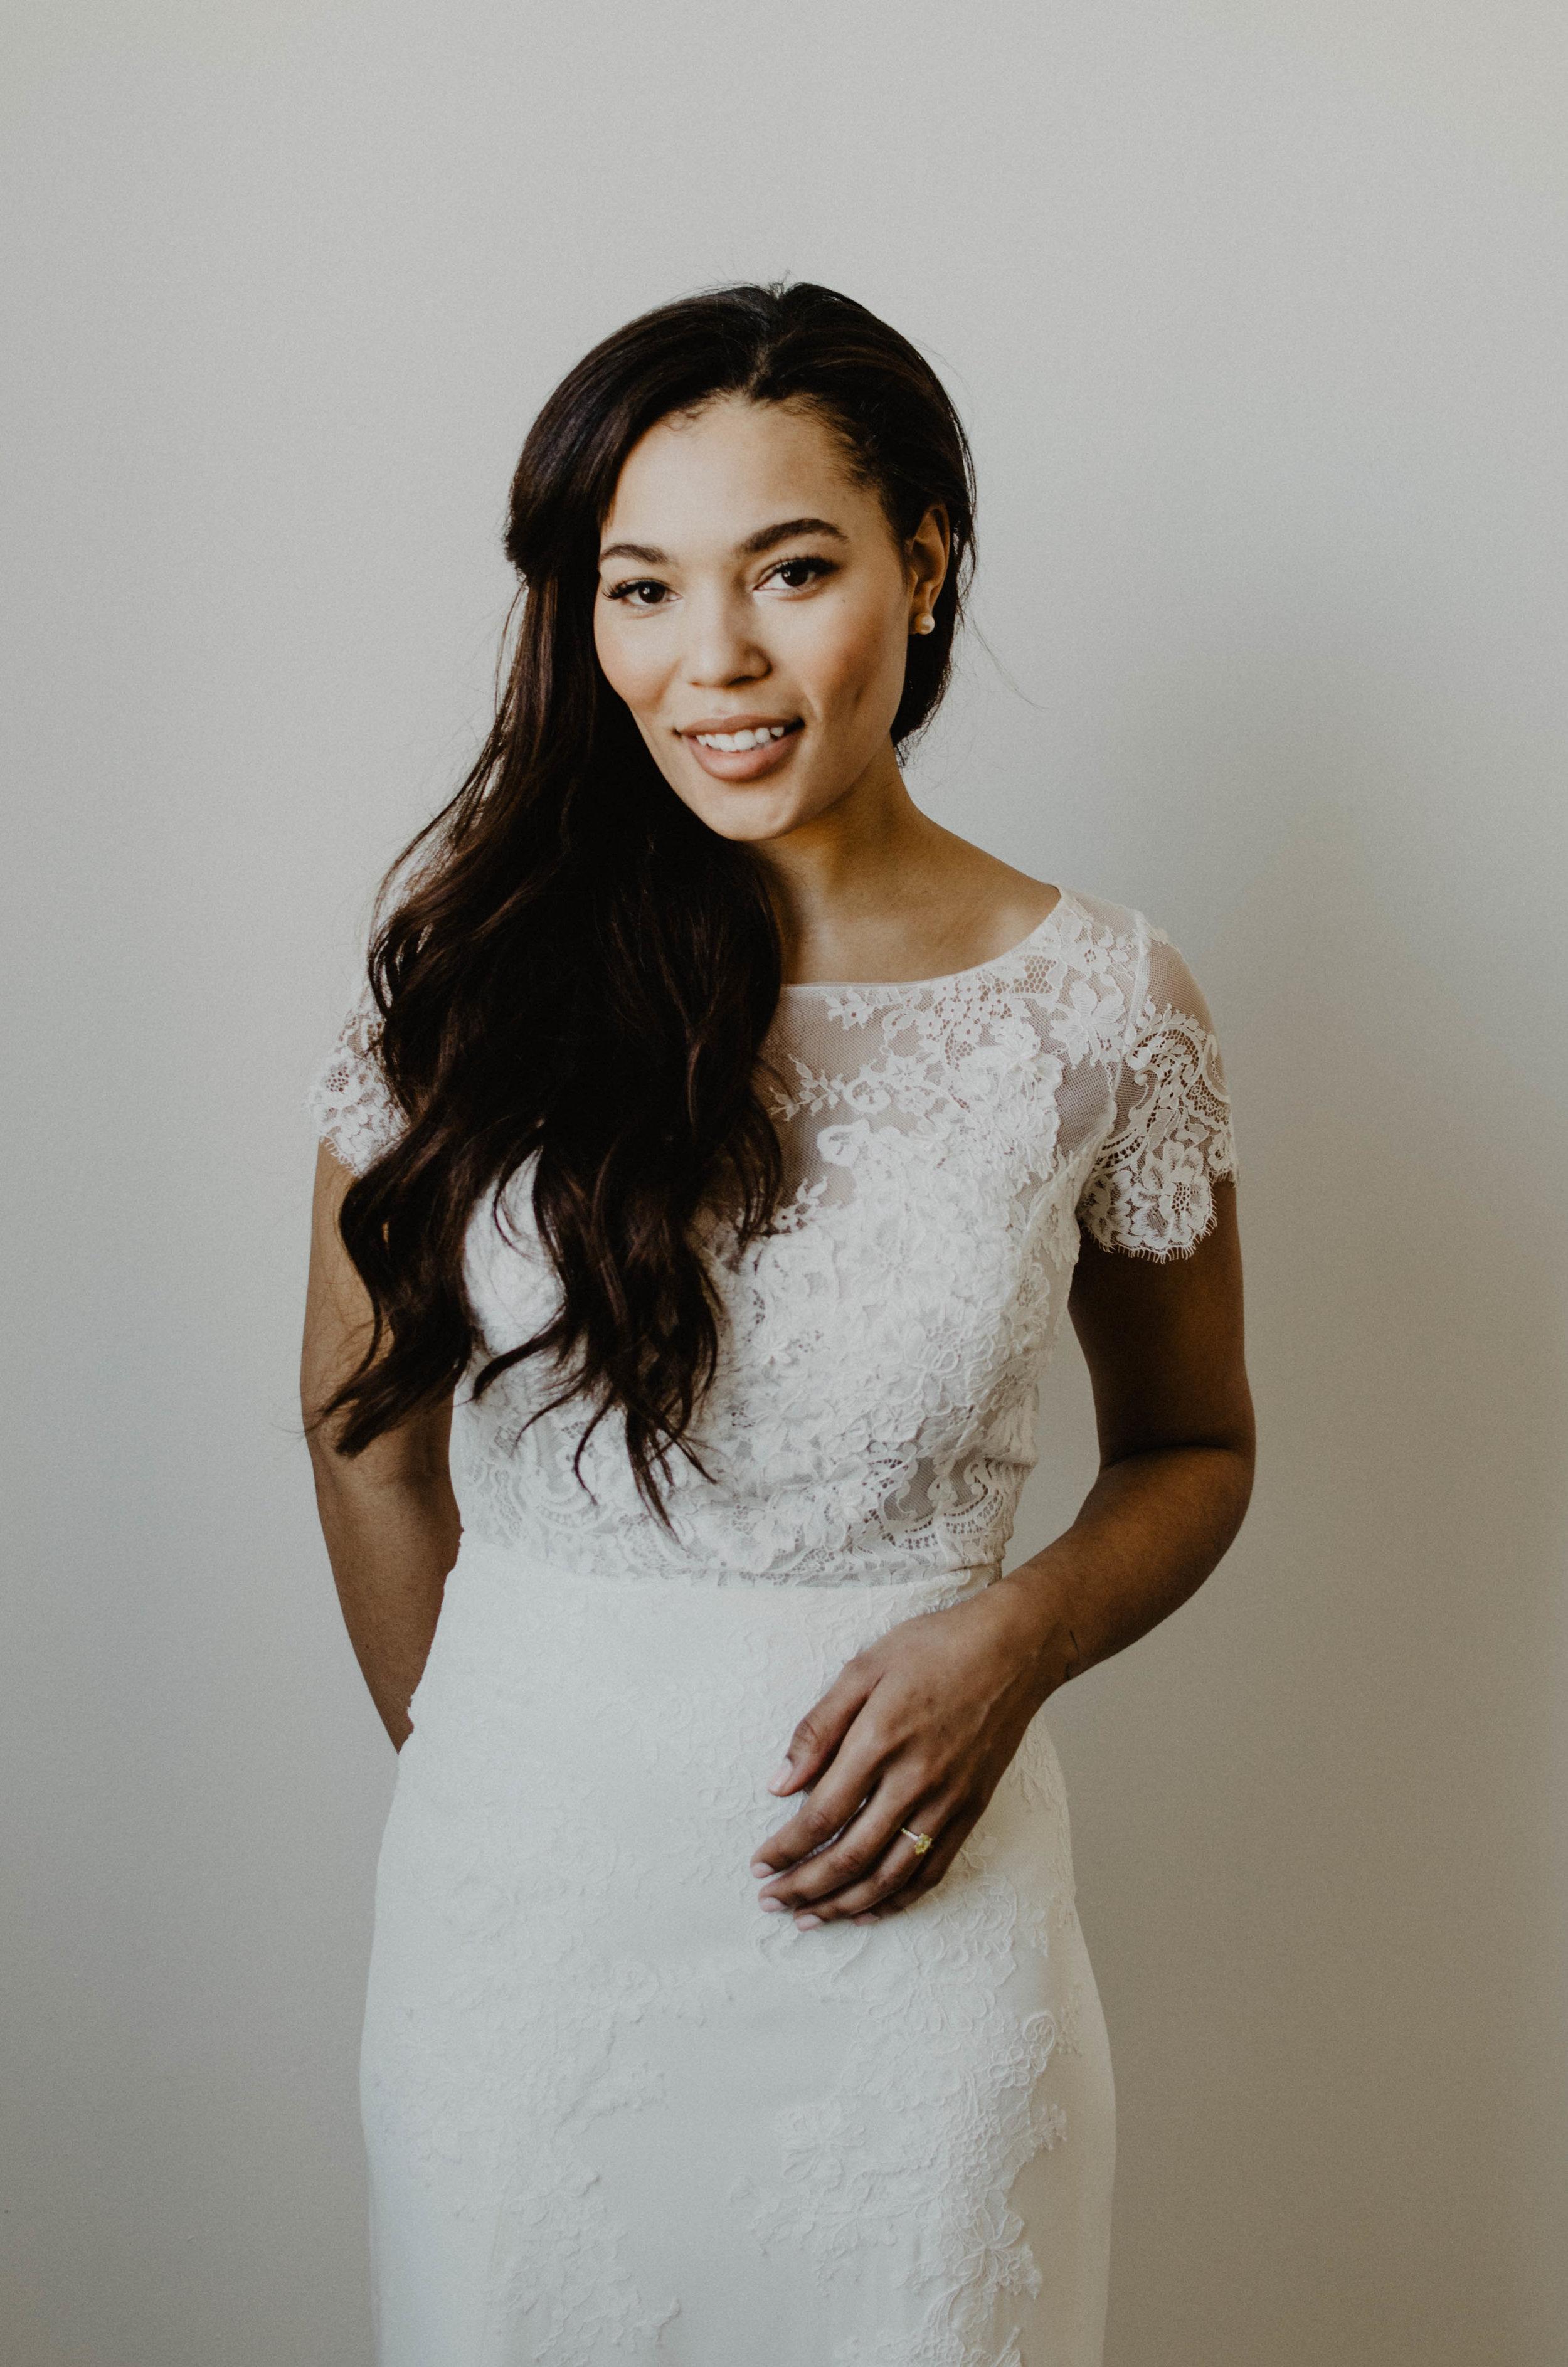 Bridal portrait in Toronto